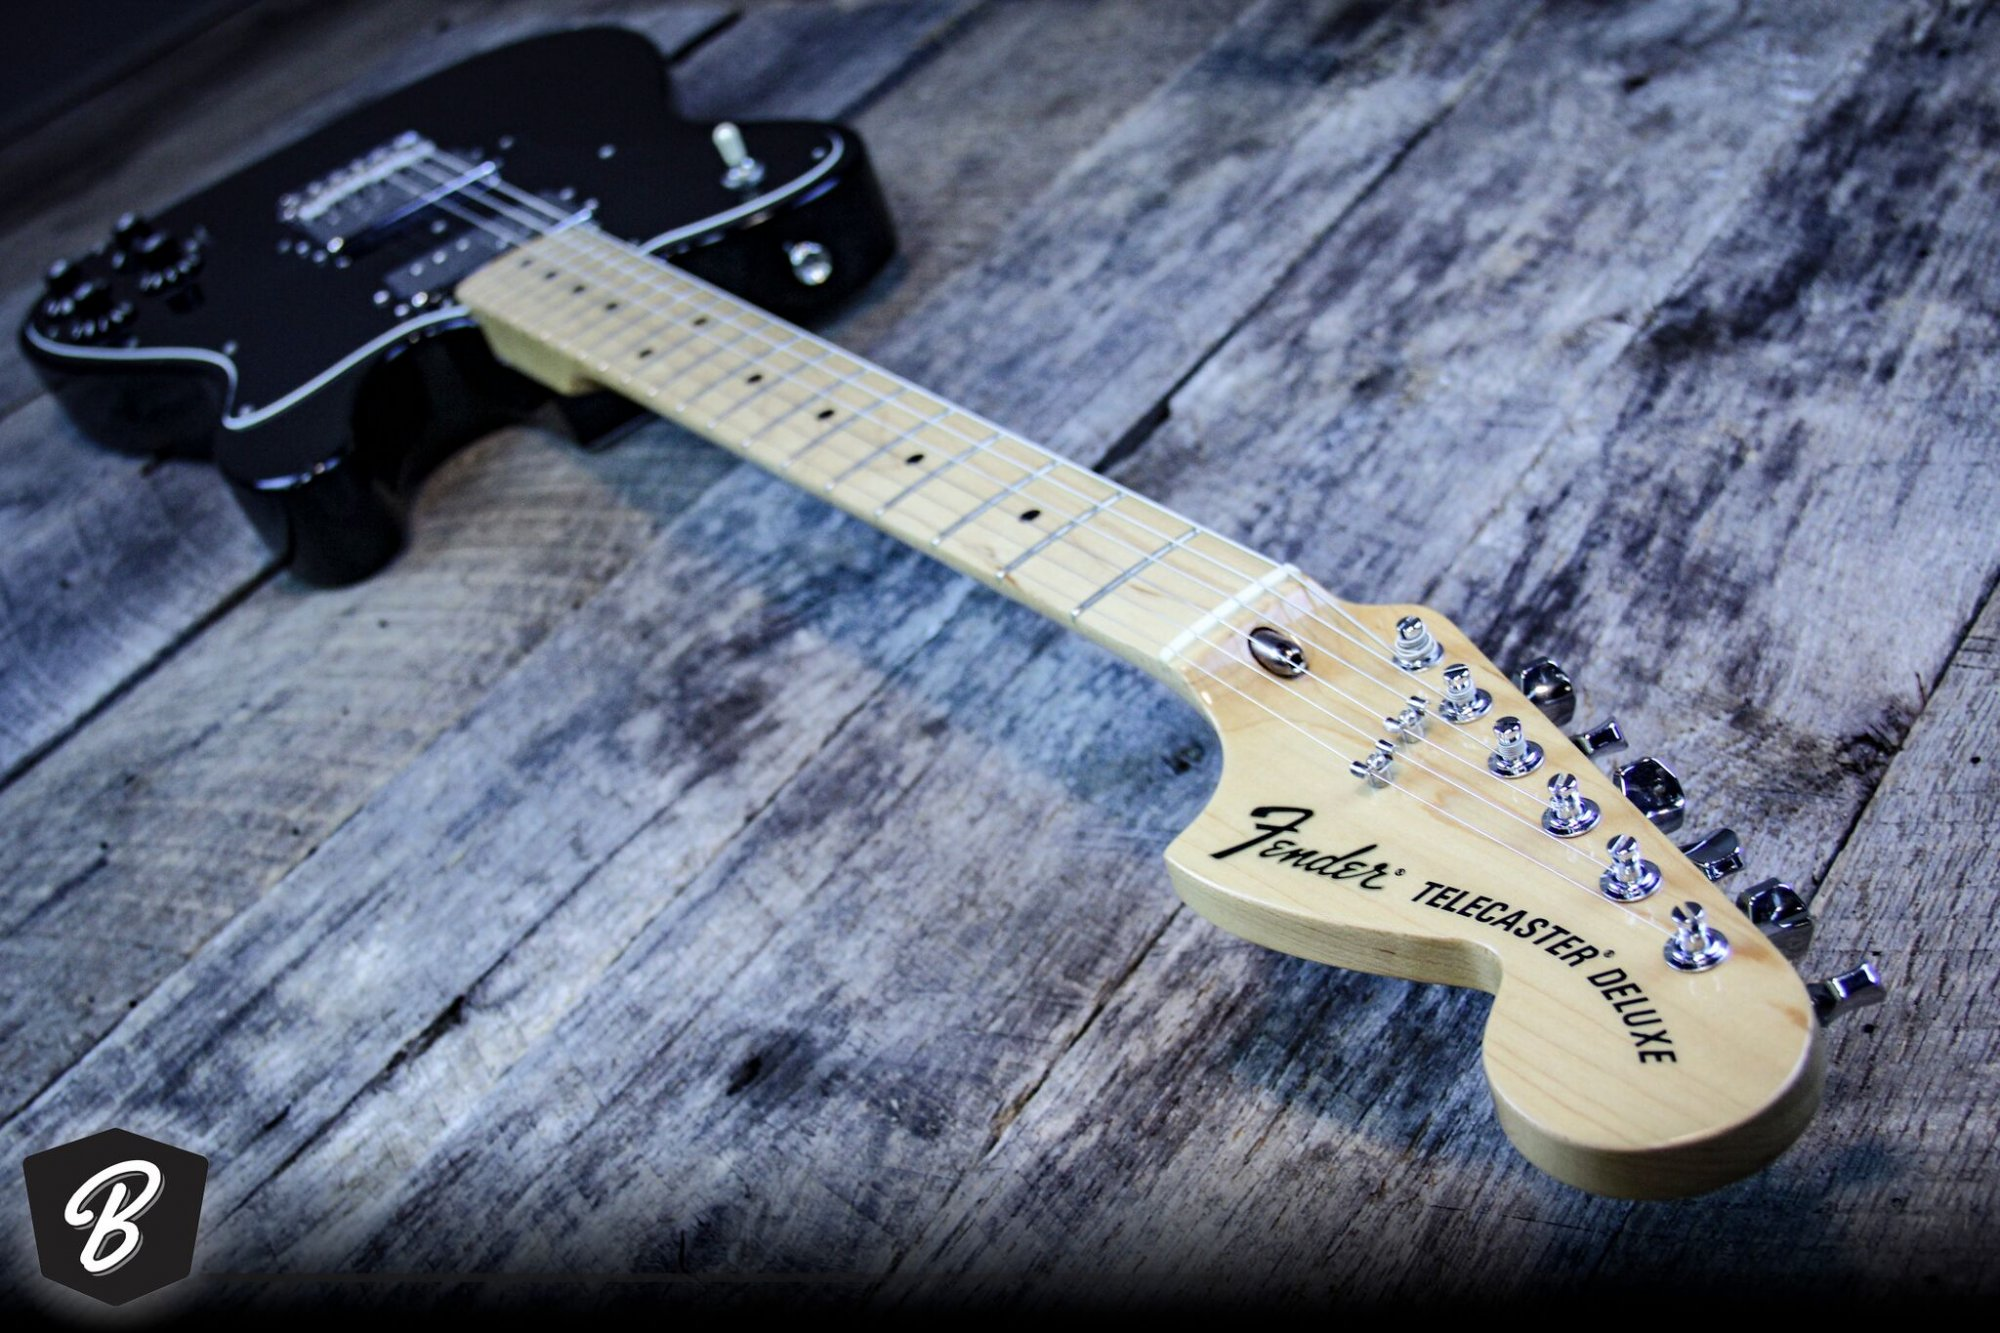 Fender '72 Deluxe Telecaster in Black